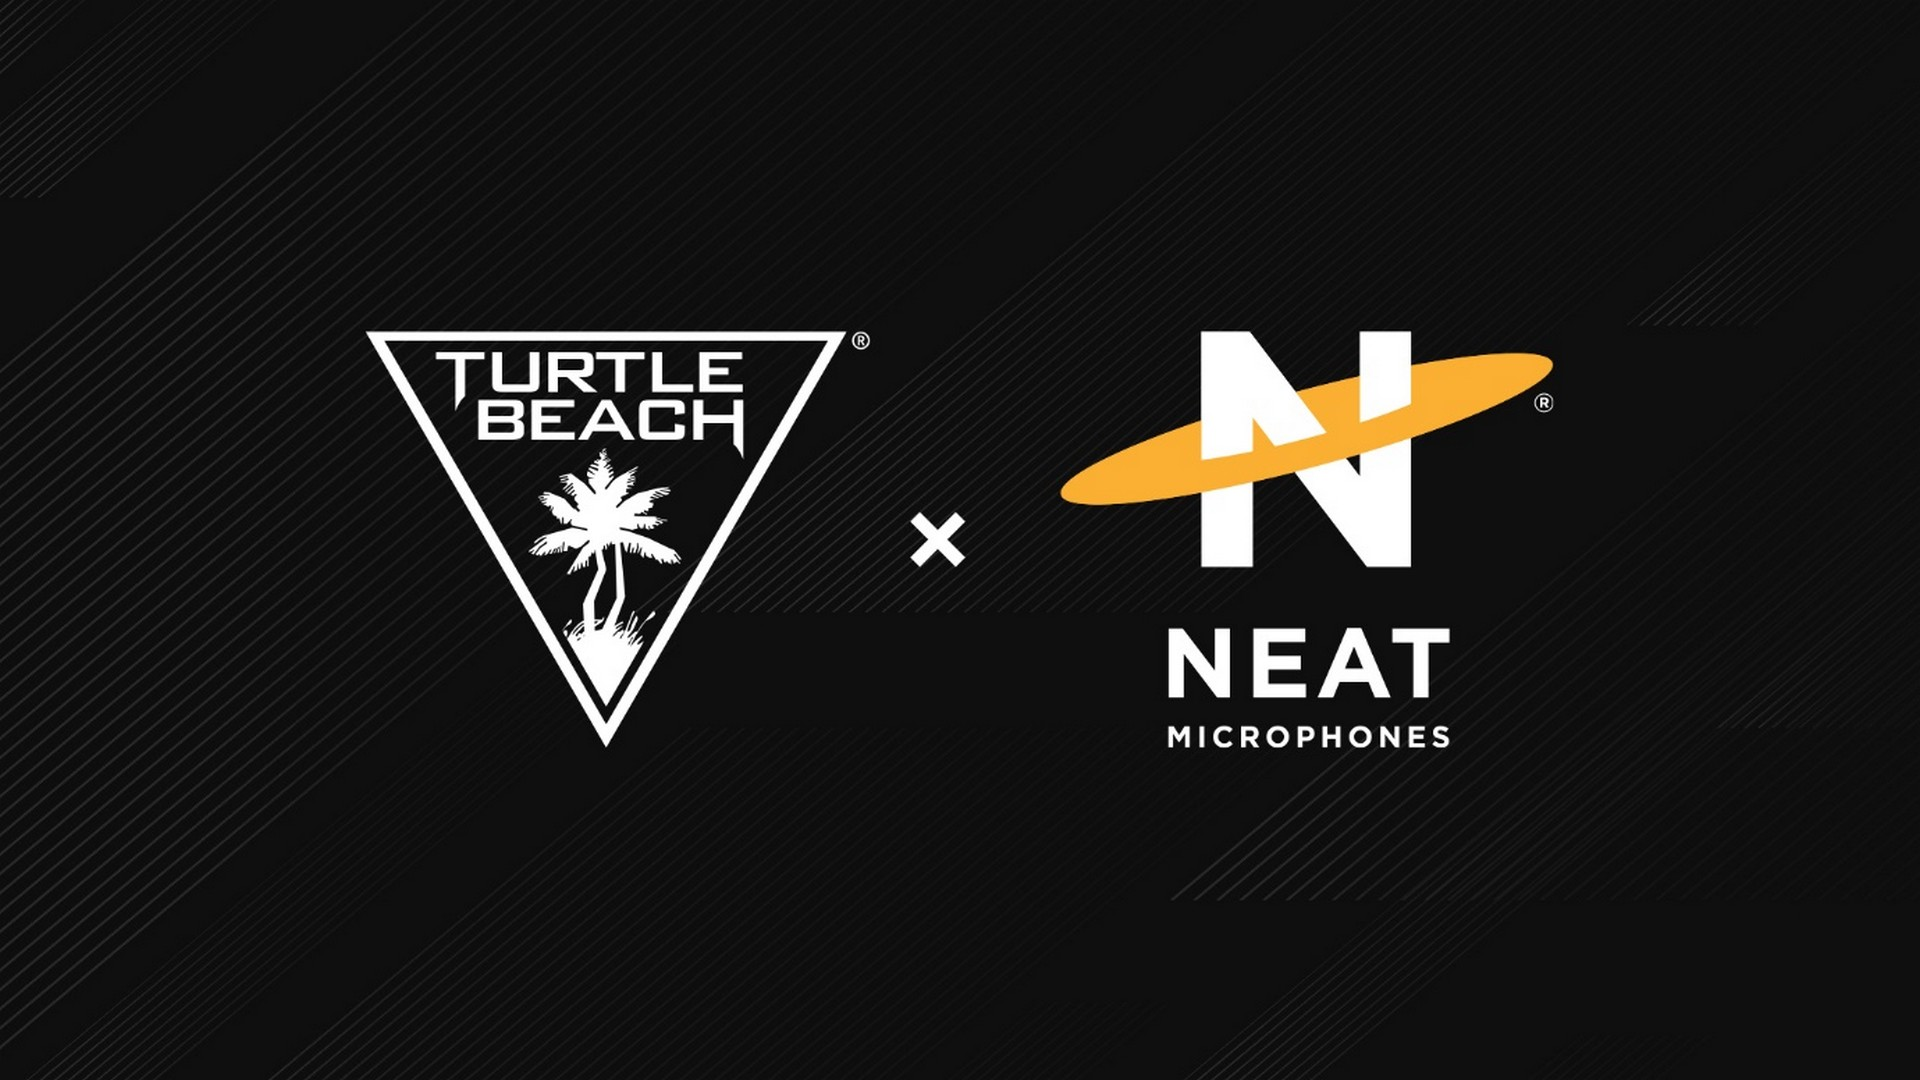 Turtle Beach Announces Acquisition Of Neat Microphones